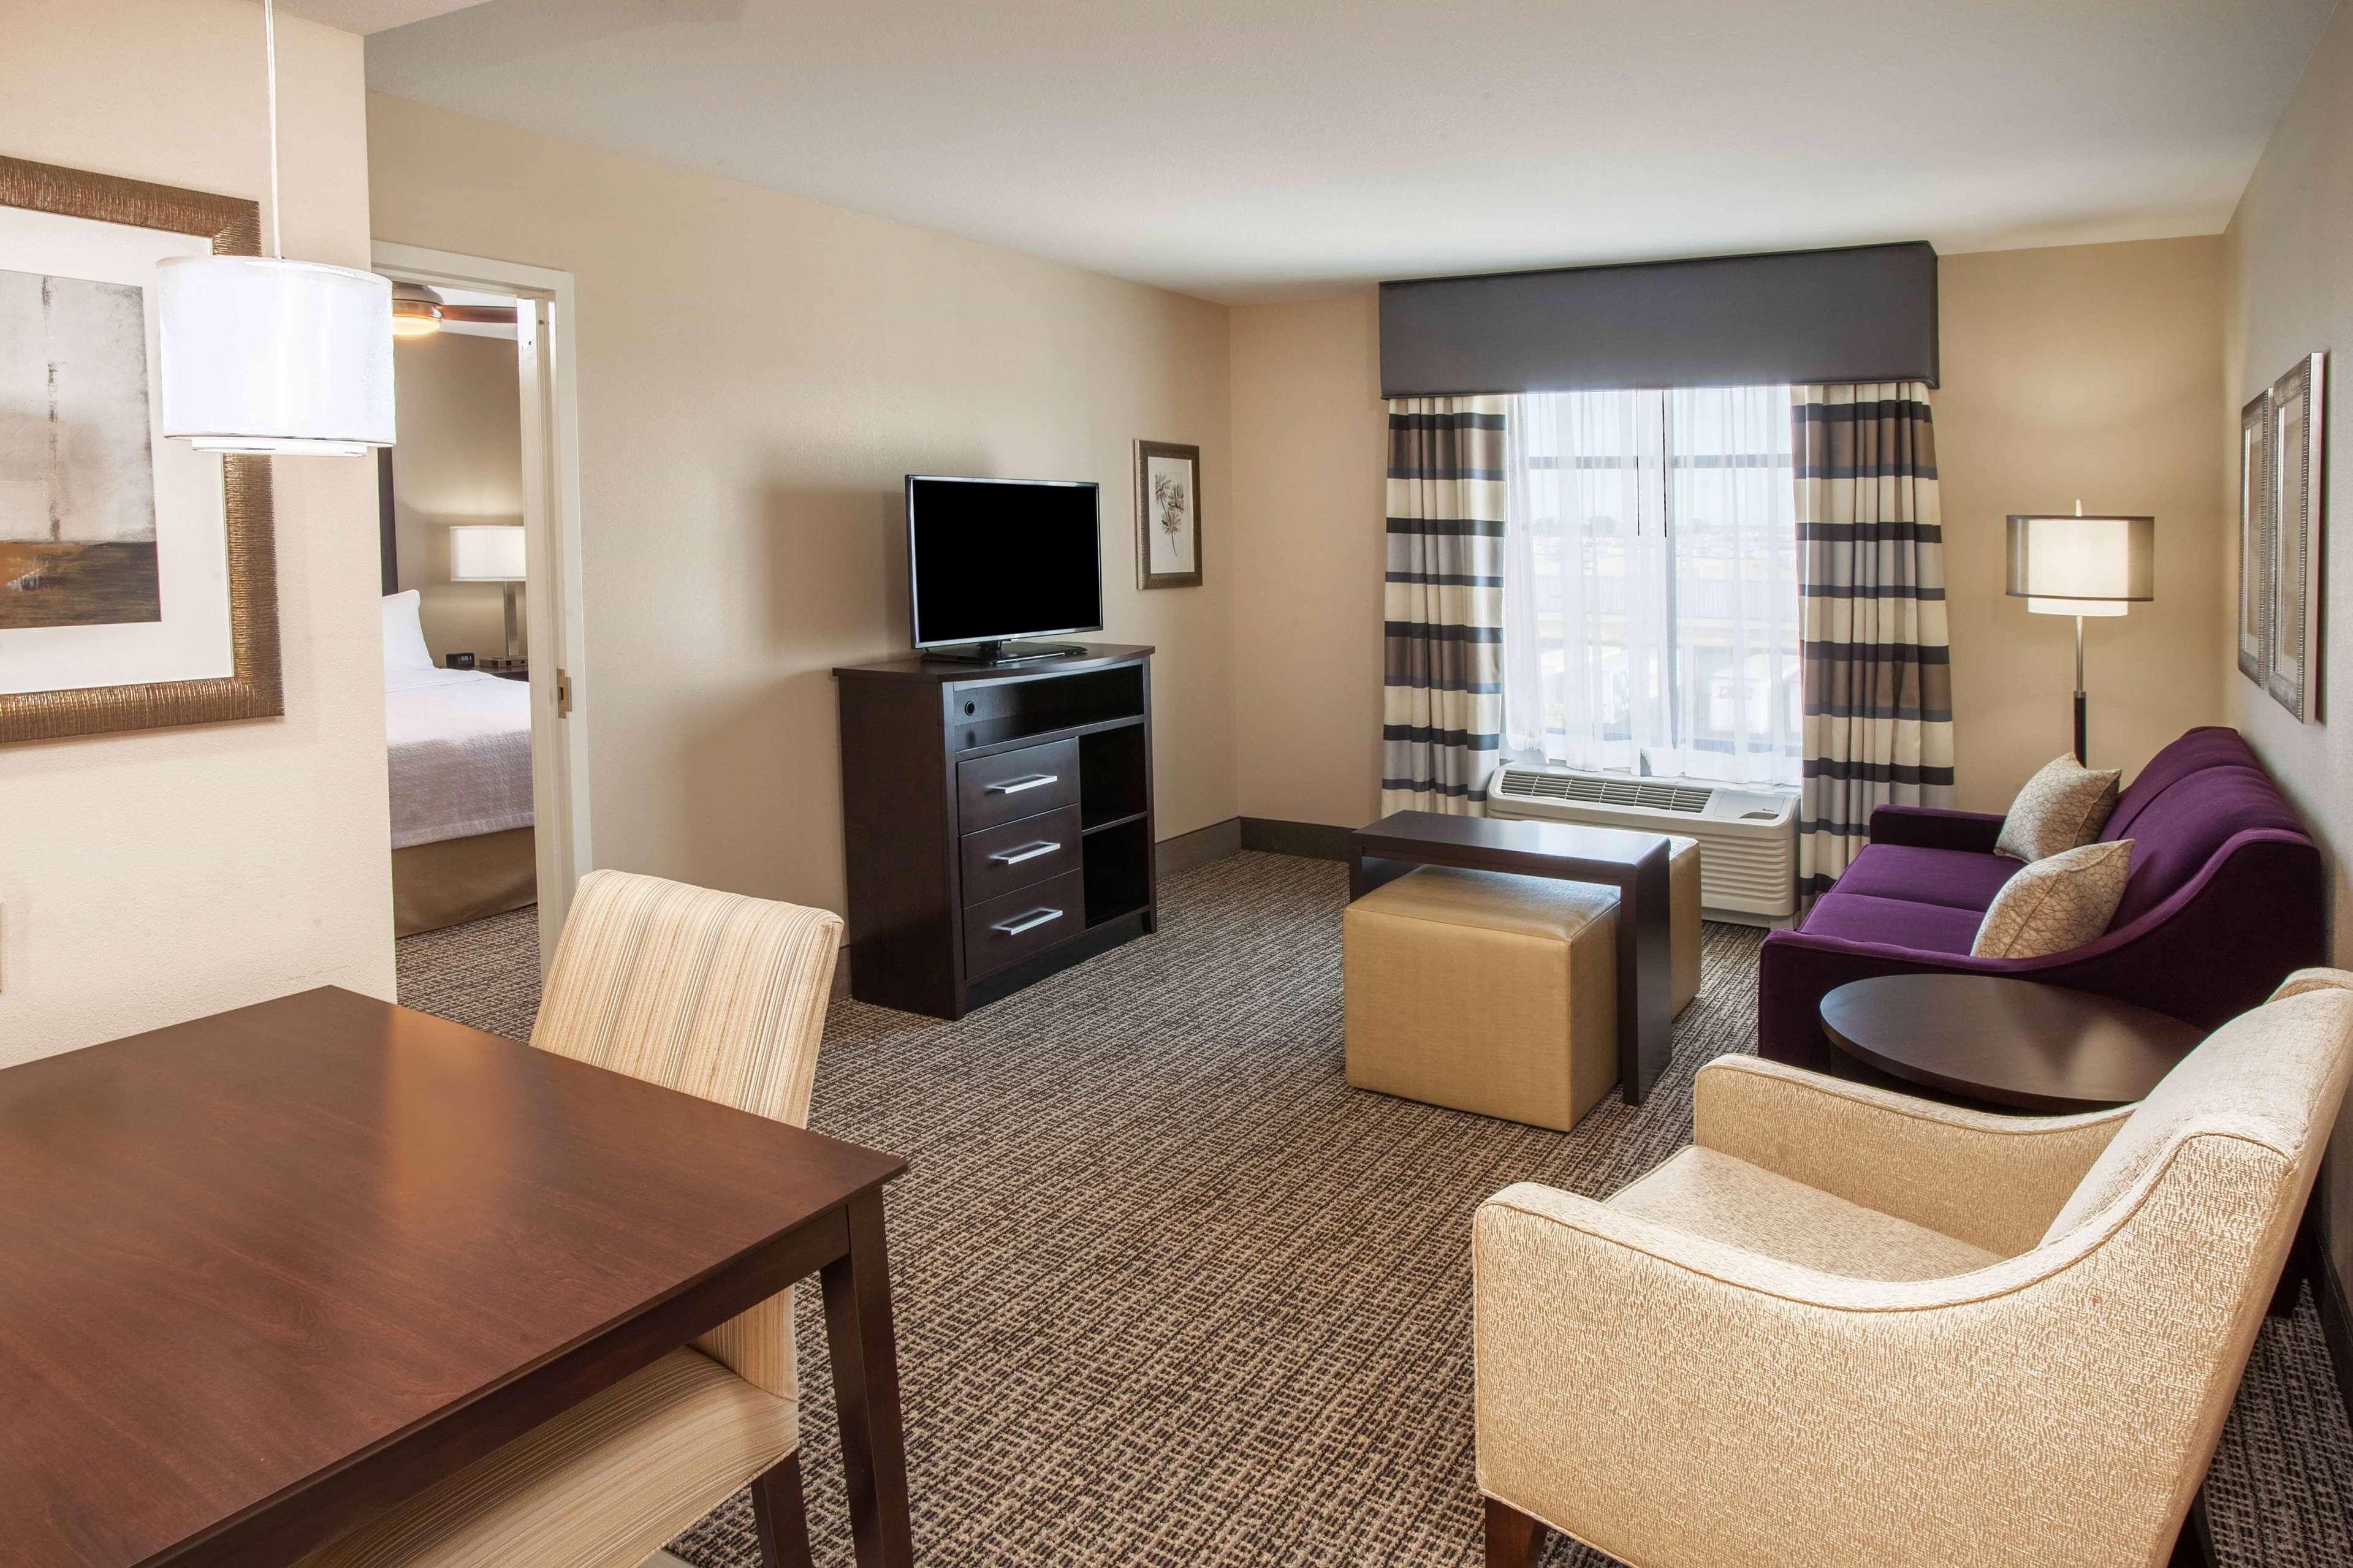 Homewood Suites by Hilton Munster image 1